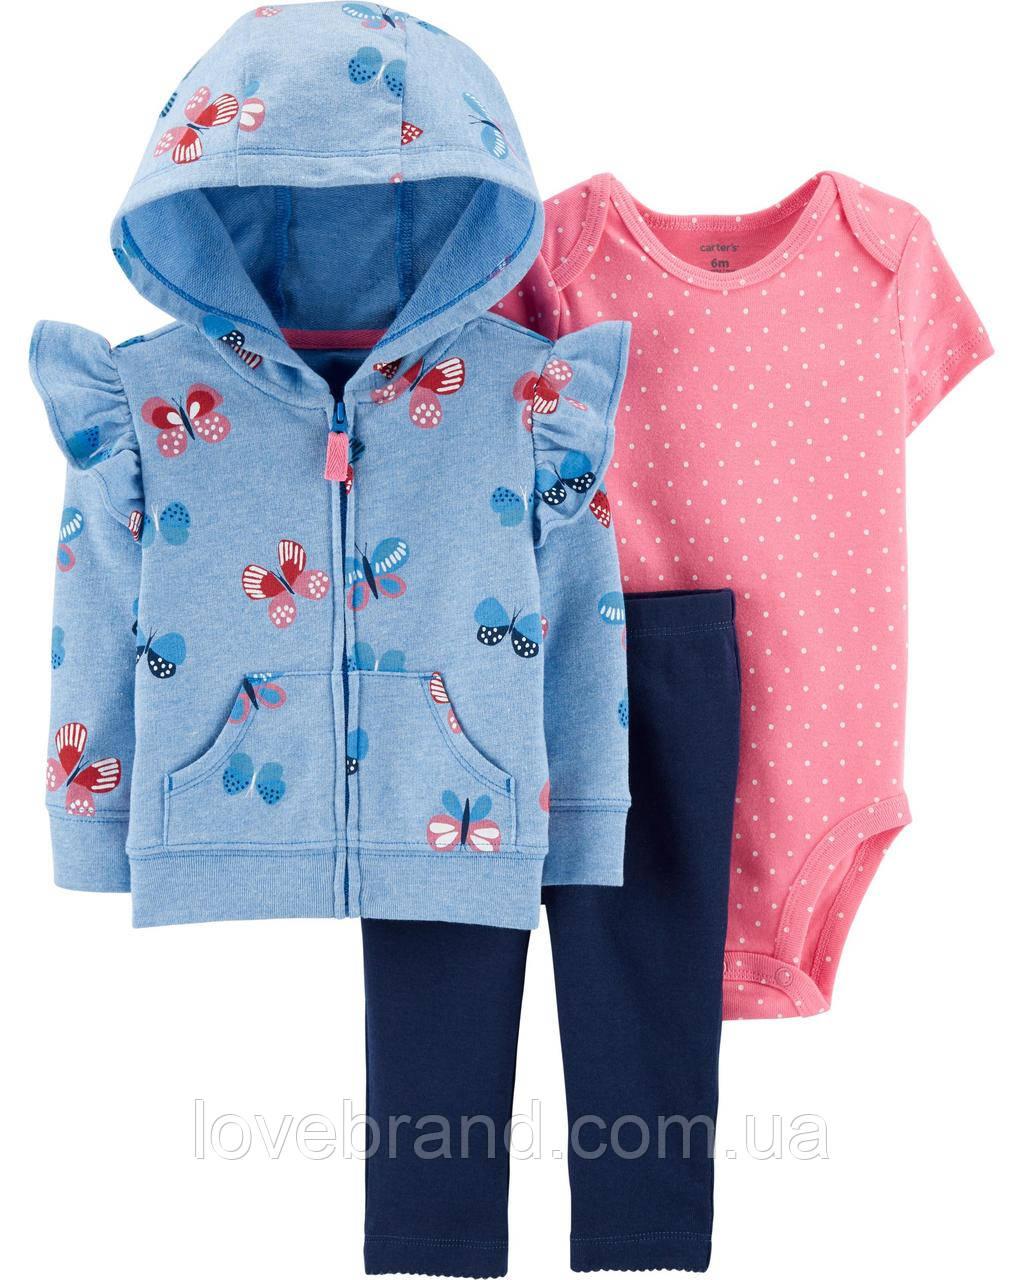 Набор для девочки Carter's Бабочки кофта+ боди + лосинки, костюмчик  картерс 9 мес/67-72 см